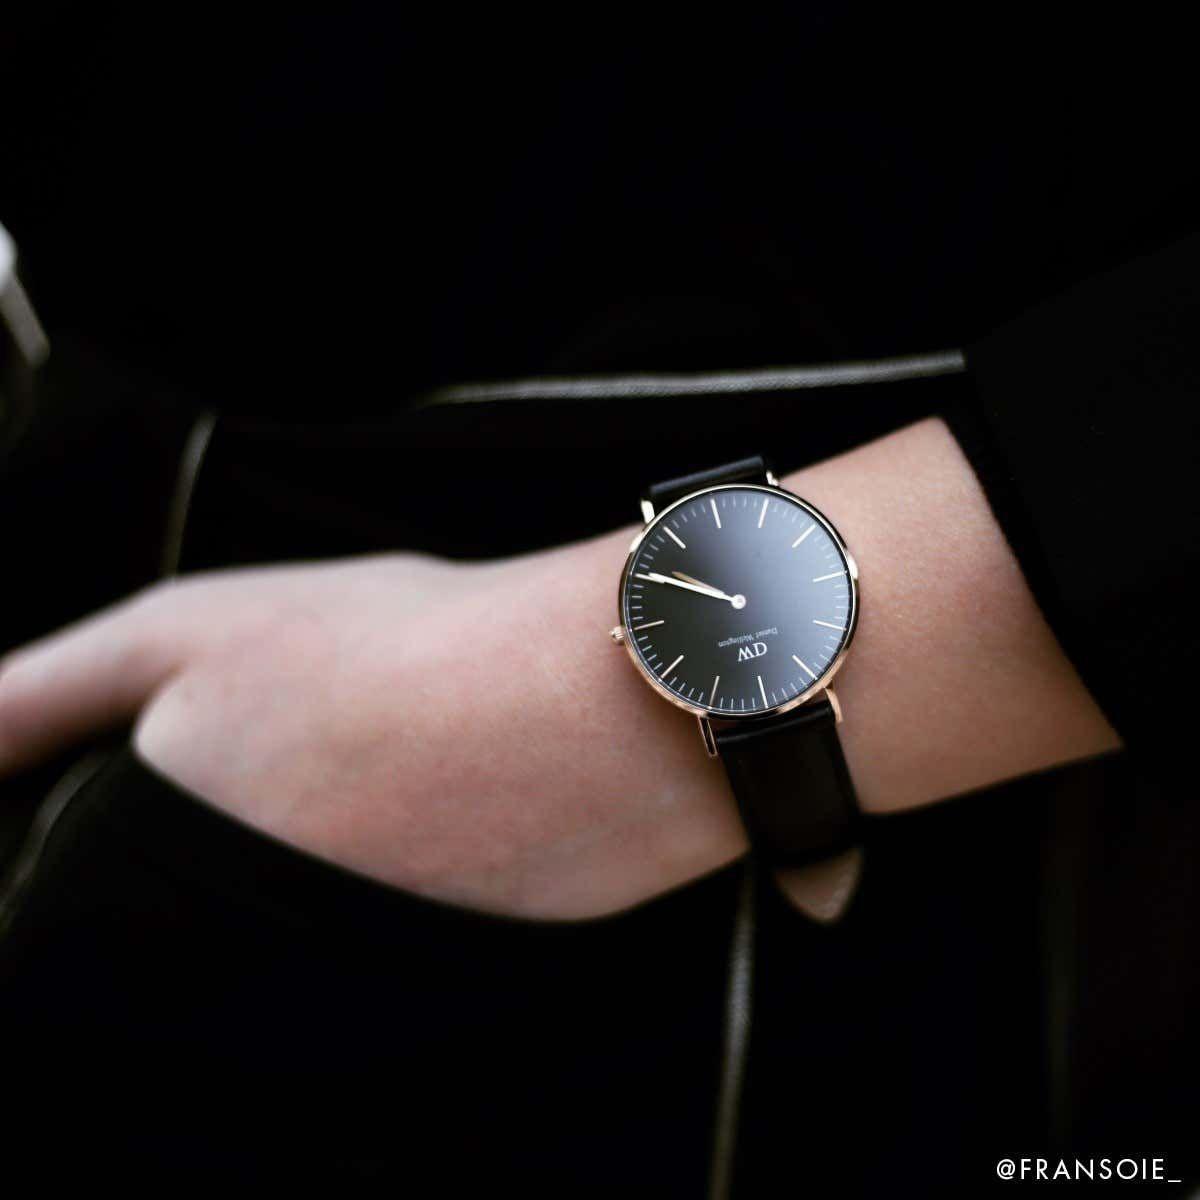 dw官网 dw手表官网 dw中国官网 dw官方旗舰店 DW DW官网  Bundle W+B Classic Black Black Sheffield RG 36mm+Classic Bracelet White RG S